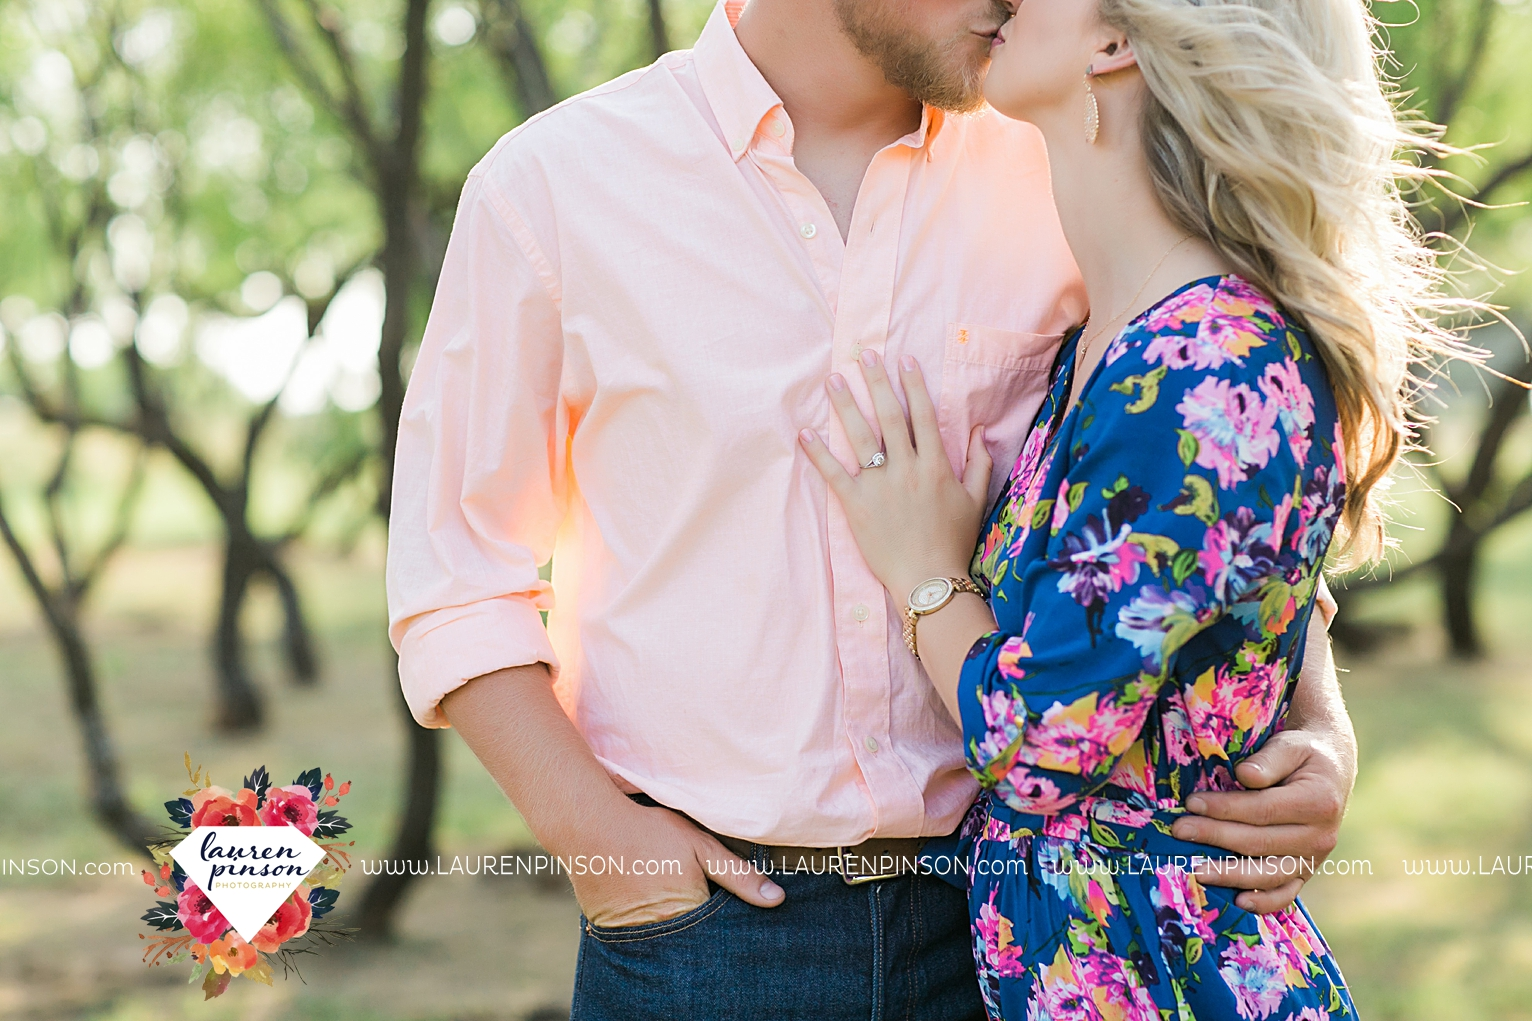 wichita-falls-texas-wedding-photographer-scotland-texas-engagement-session-country-barn-field-windthorst_2735.jpg